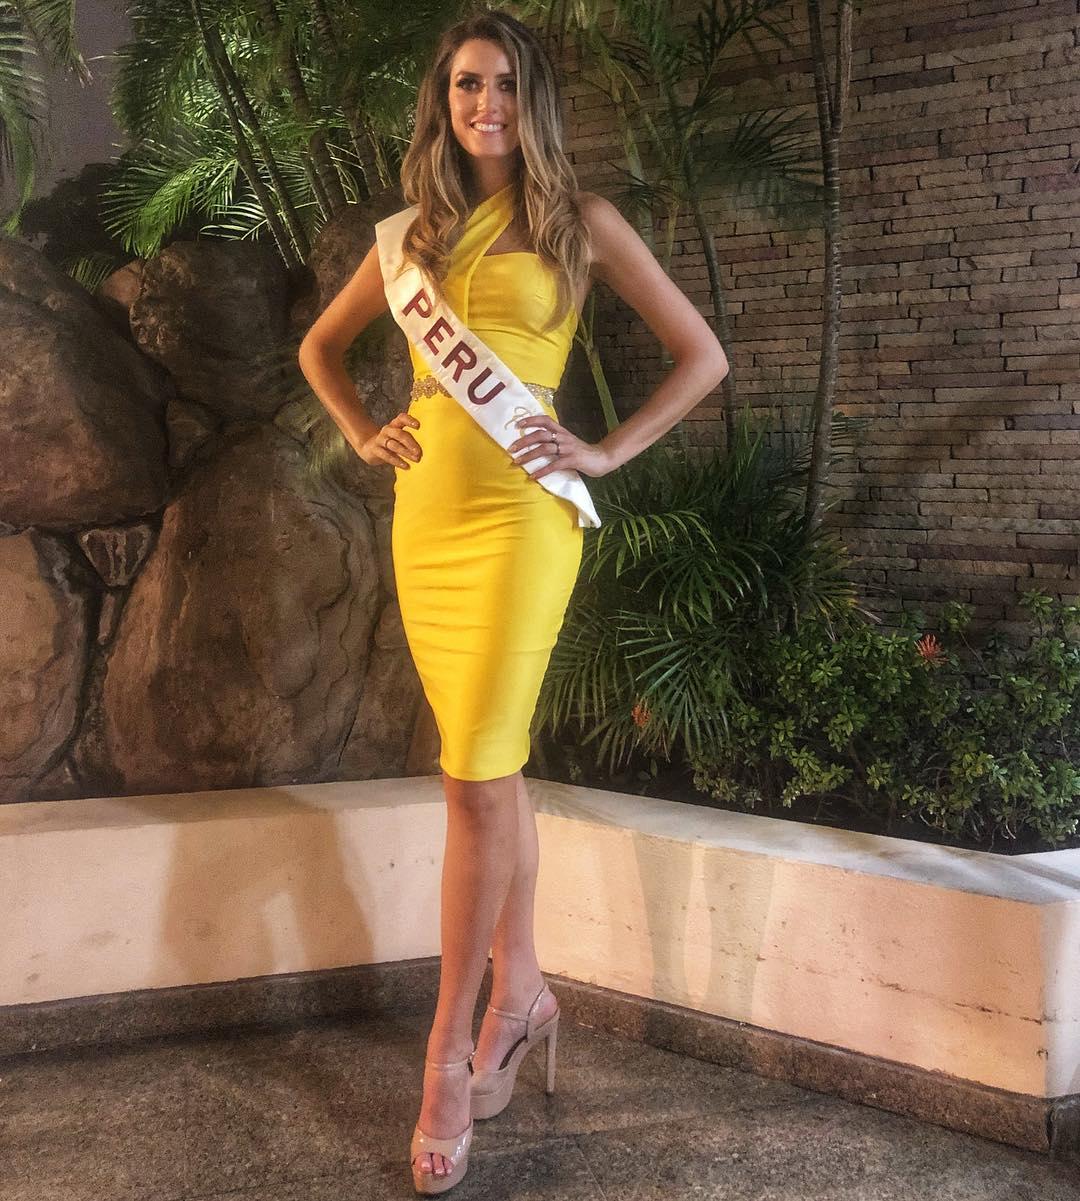 jessica mcfarlane, 7 finalista de reyna hispanoamericana 2018. - Página 3 43817713